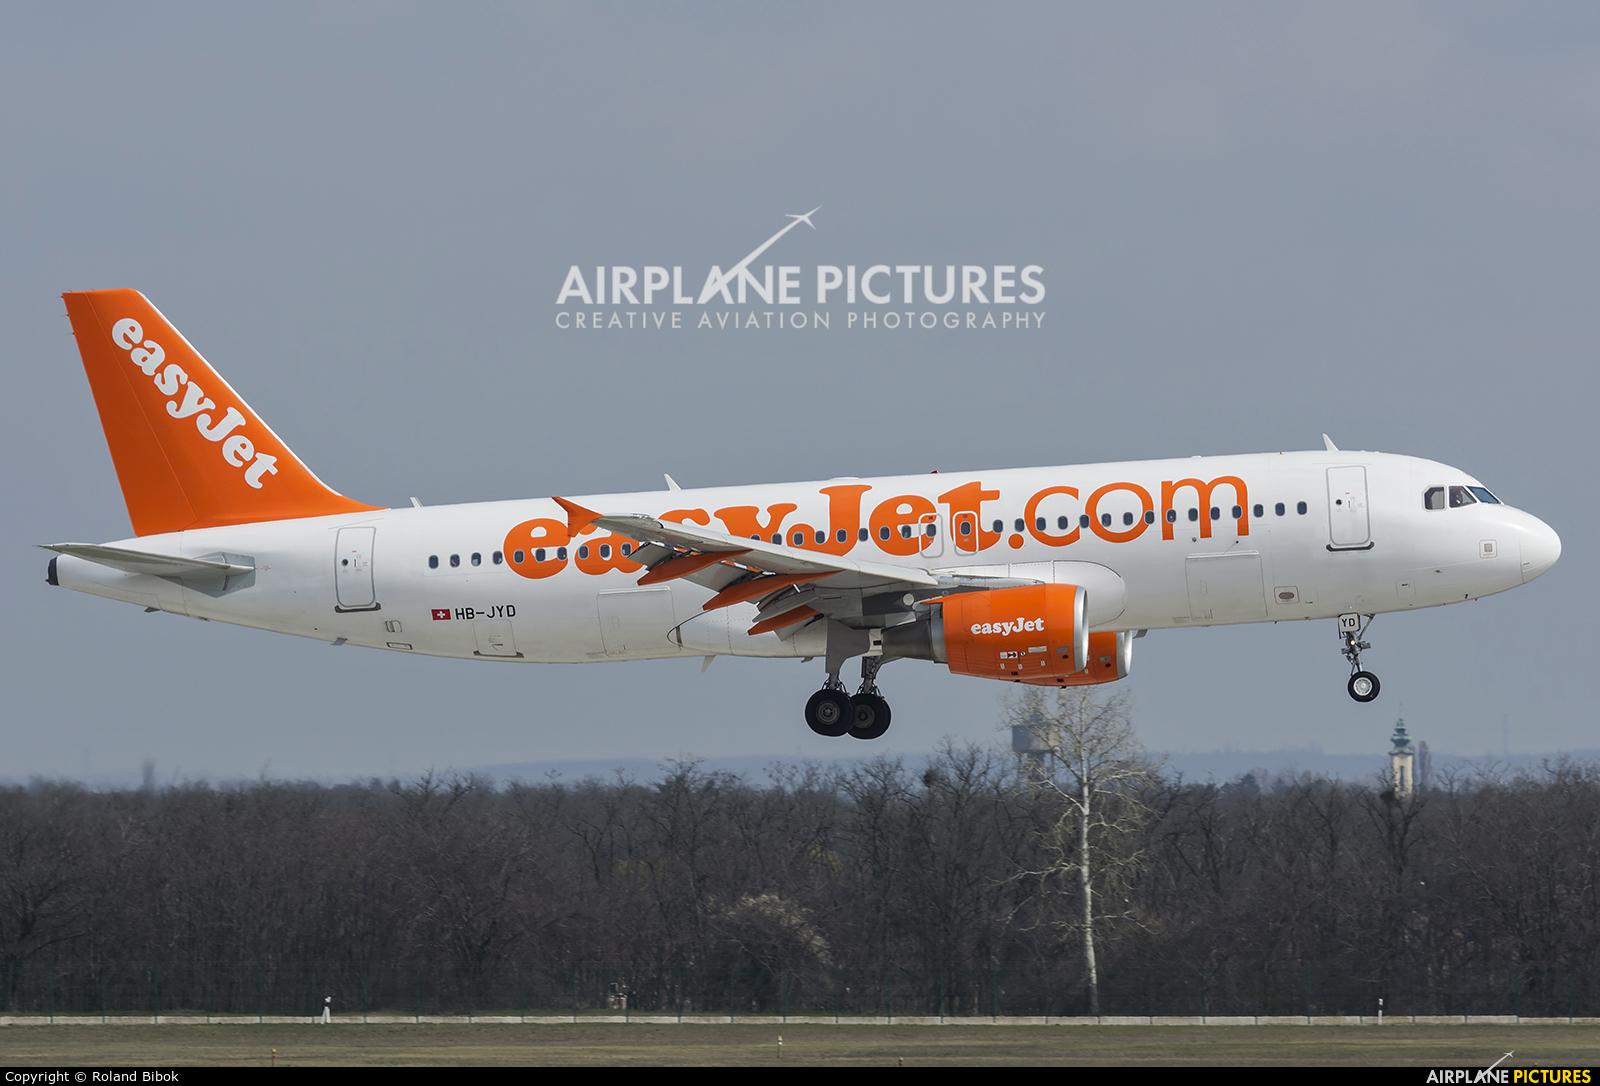 easyJet Switzerland HB-JYD aircraft at Budapest Ferenc Liszt International Airport